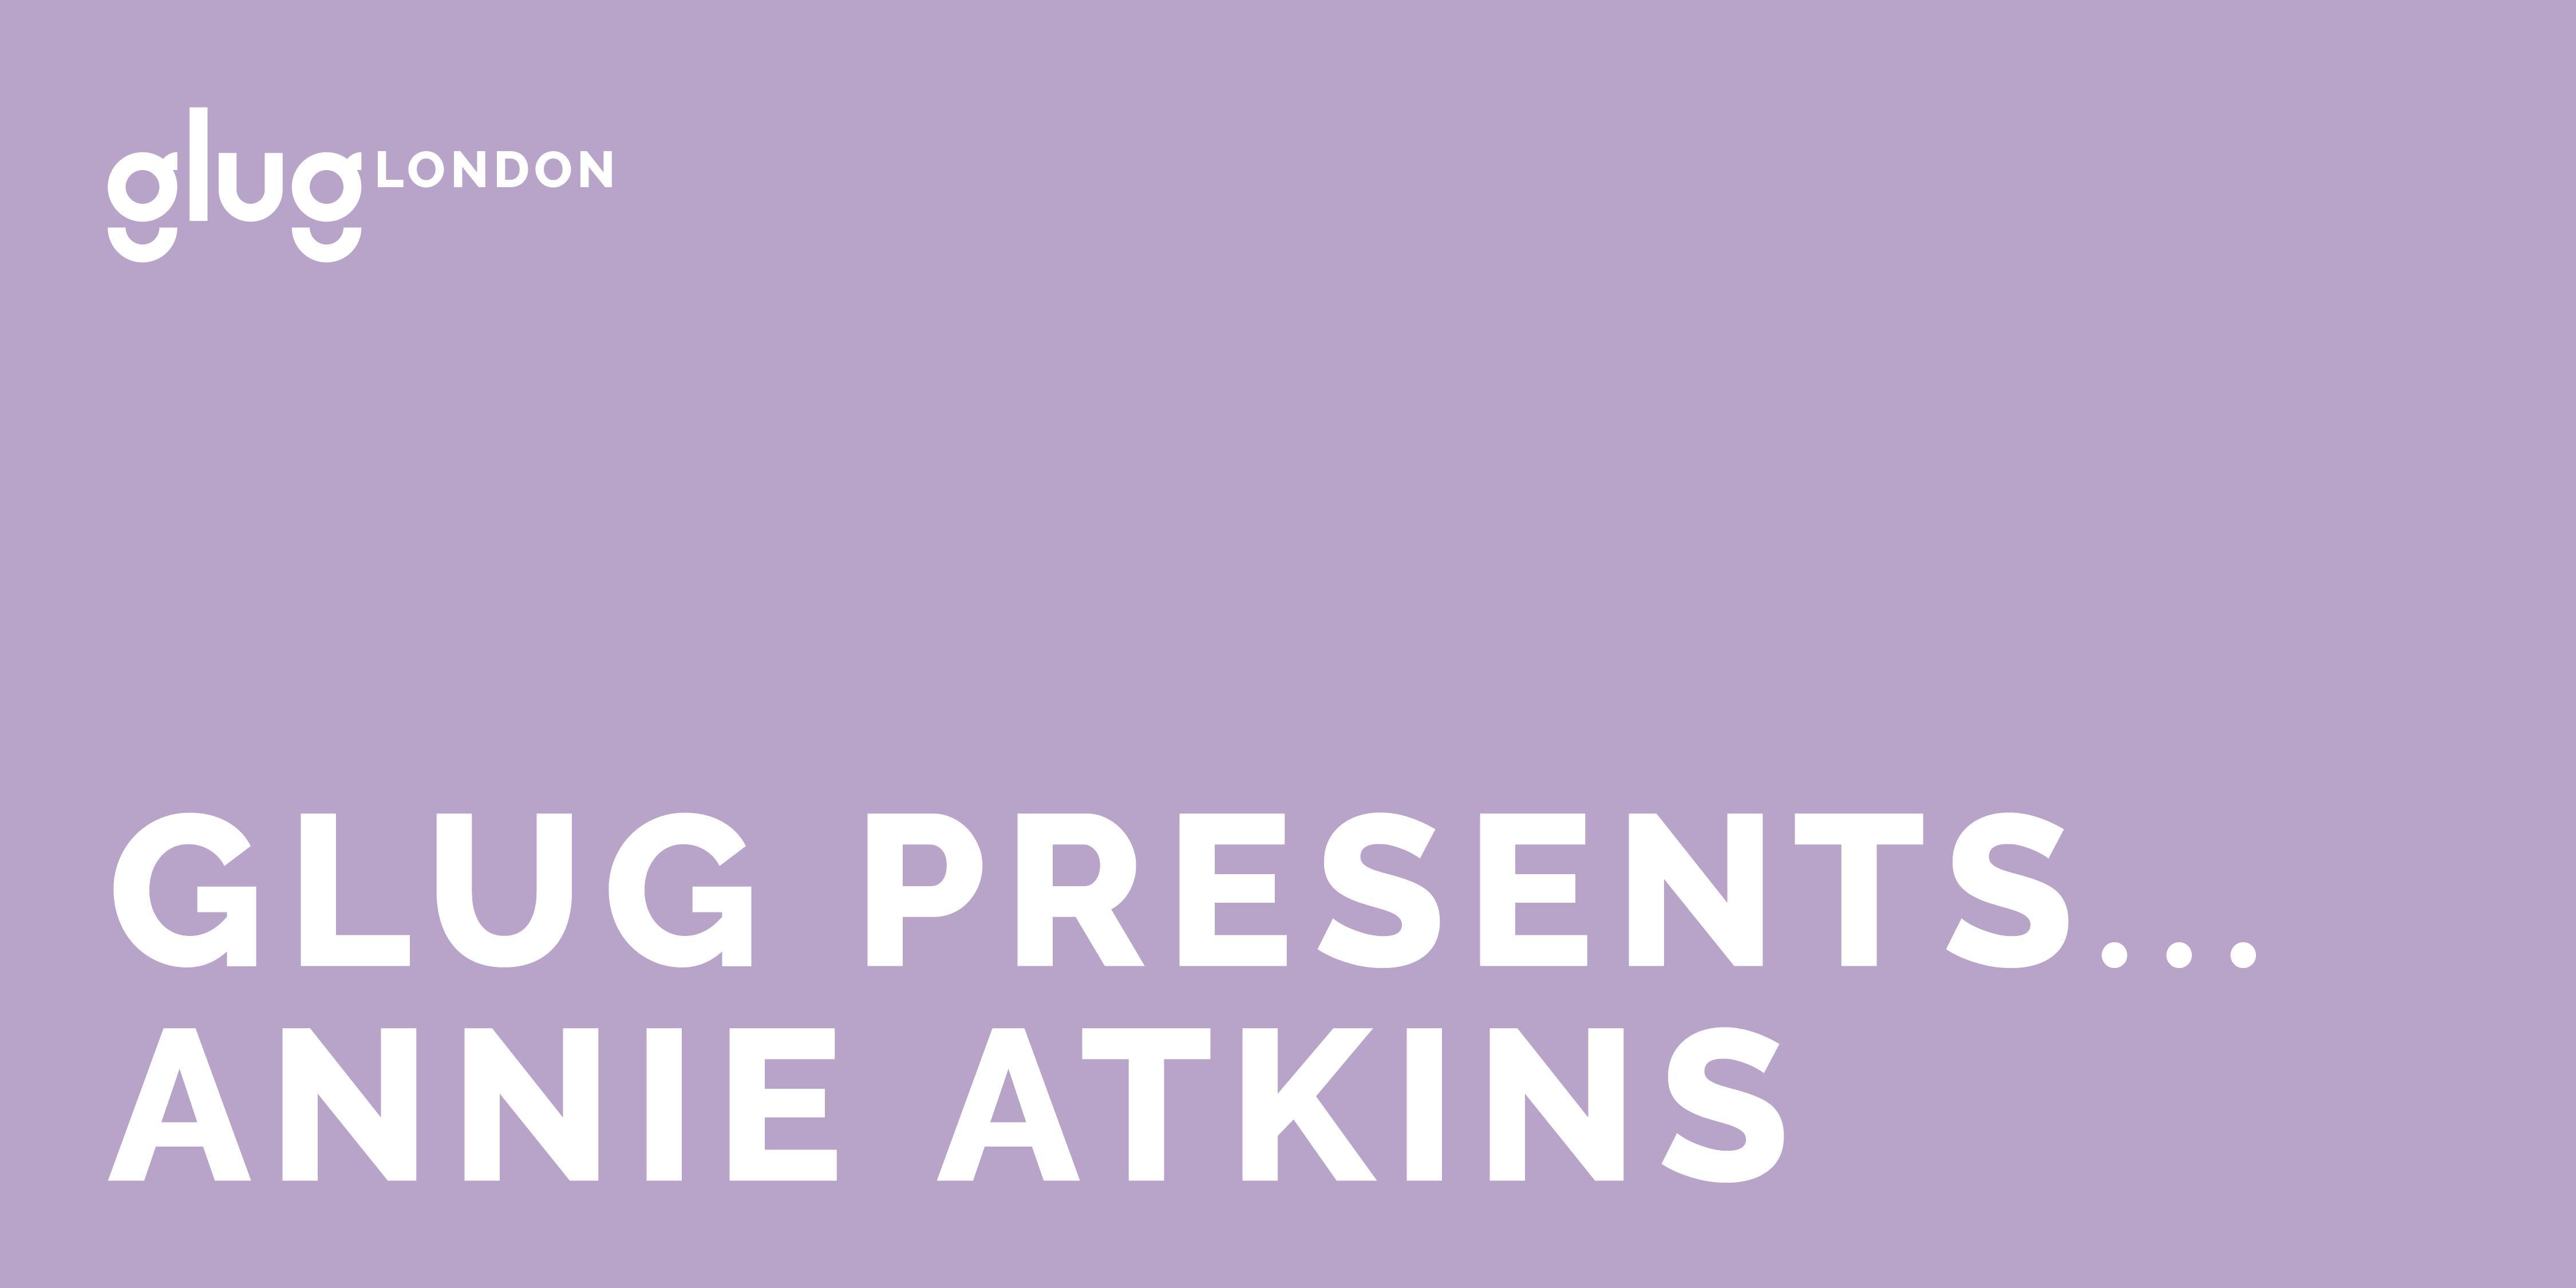 Glug Presents... Annie Atkins